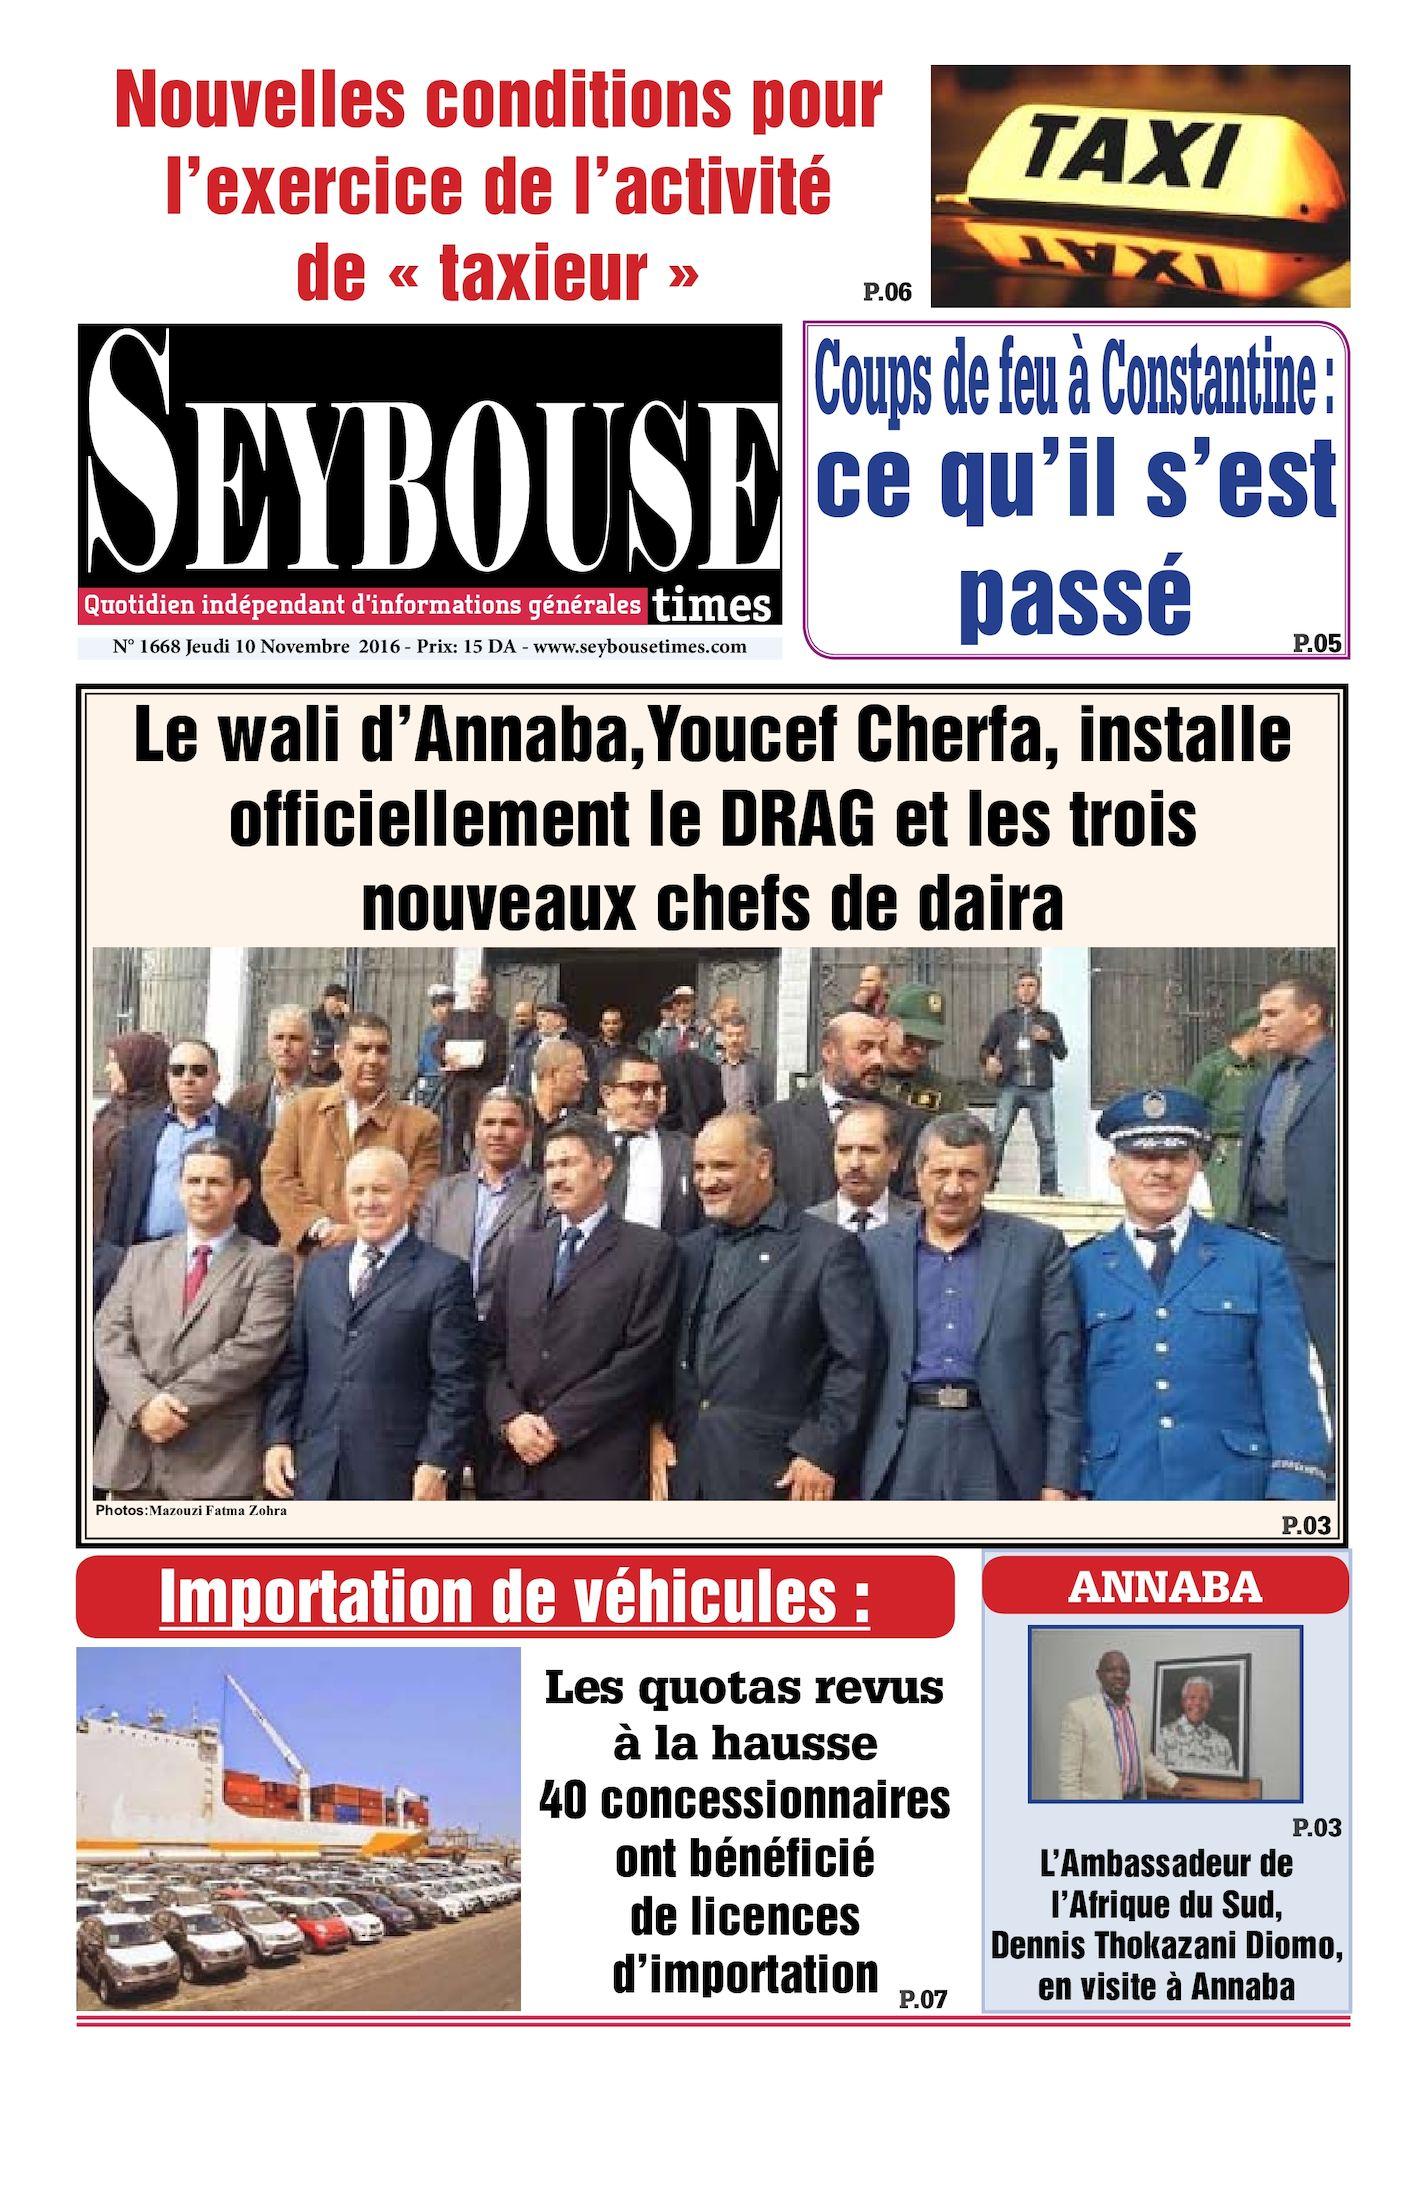 Seybouse Times 1668